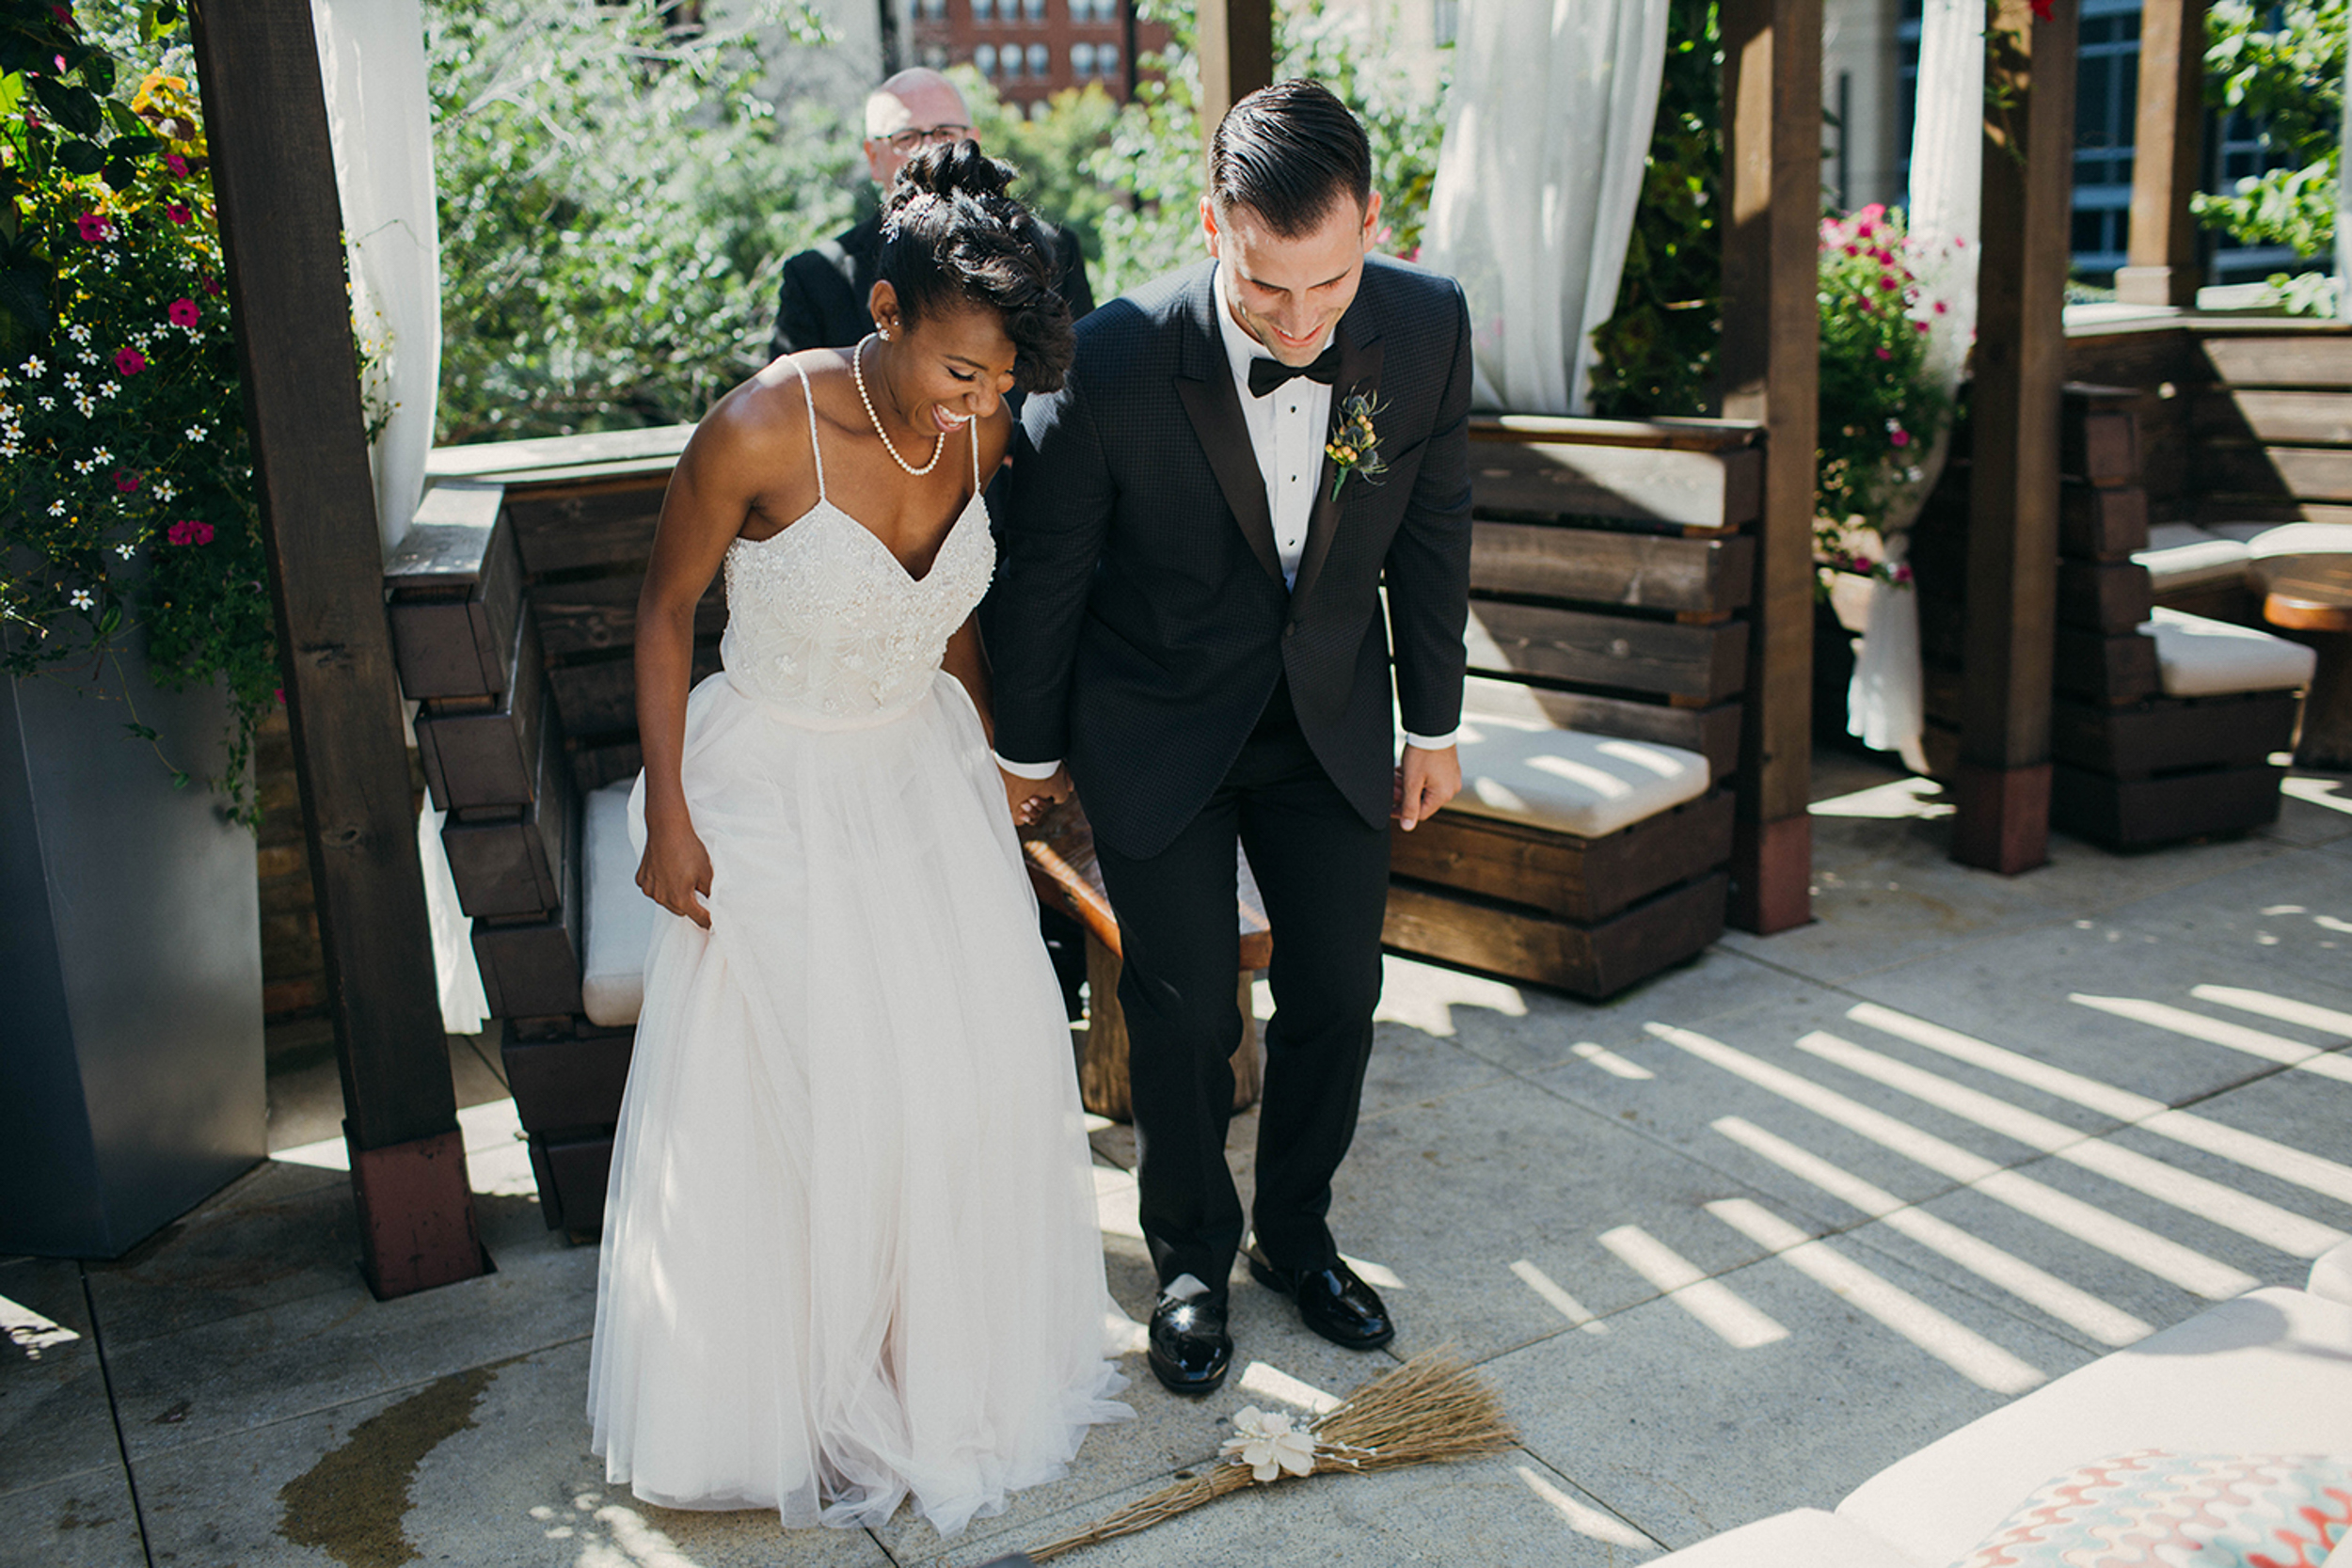 chicago.wedding.urban.intimate.zed451.lake.milton olive park-53.jpg